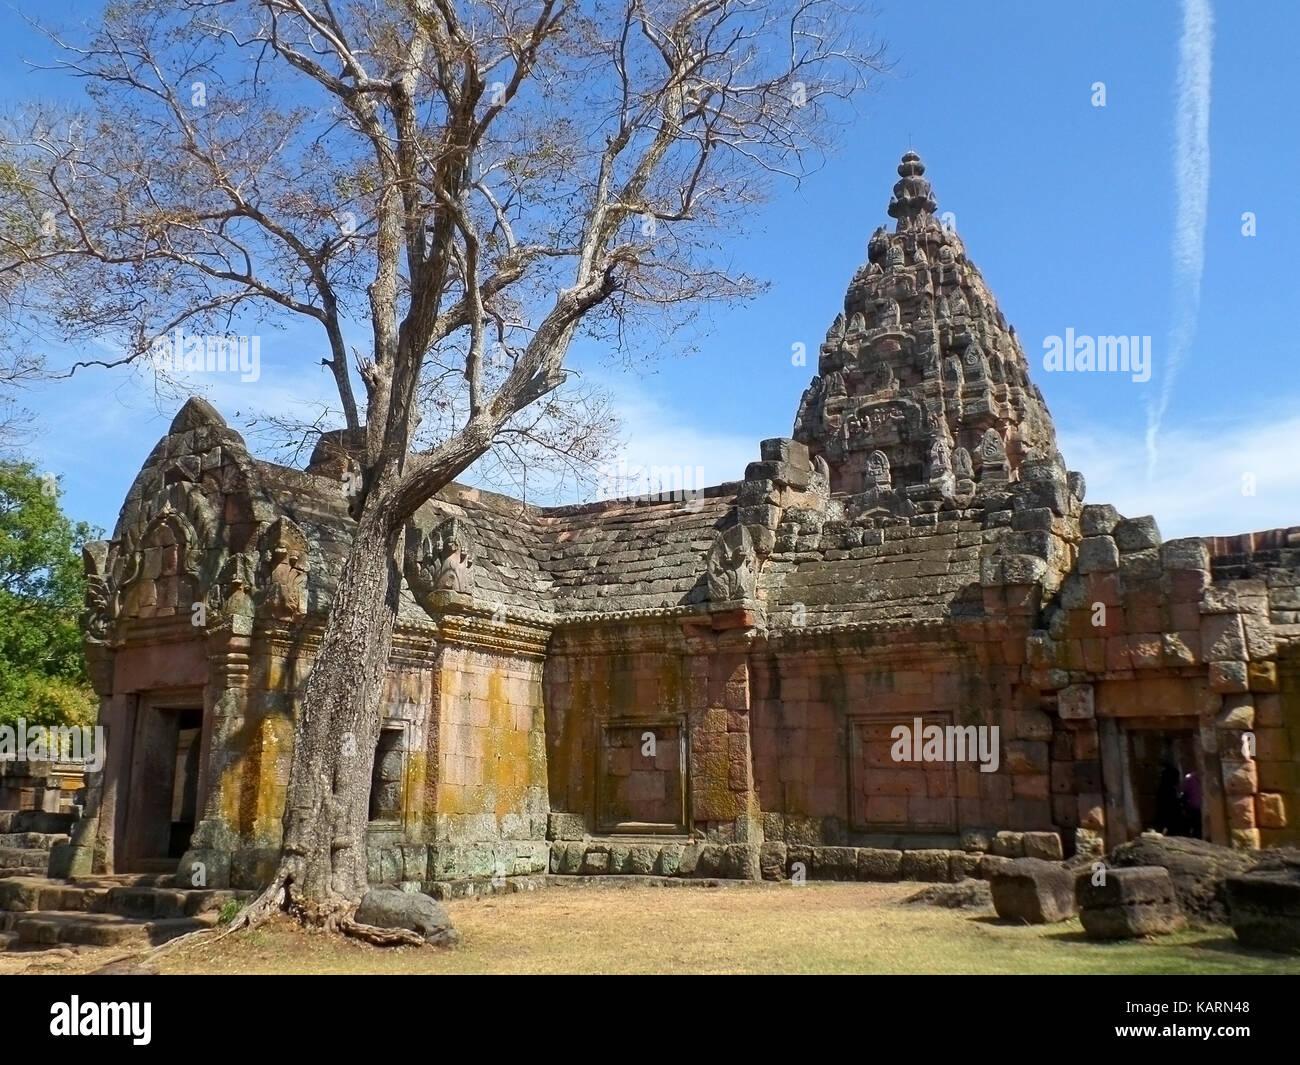 The Impressive Prasat Hin Phanom Rung Ancient Khmer Temple under Vivid Blue Sky, Thailand - Stock Image